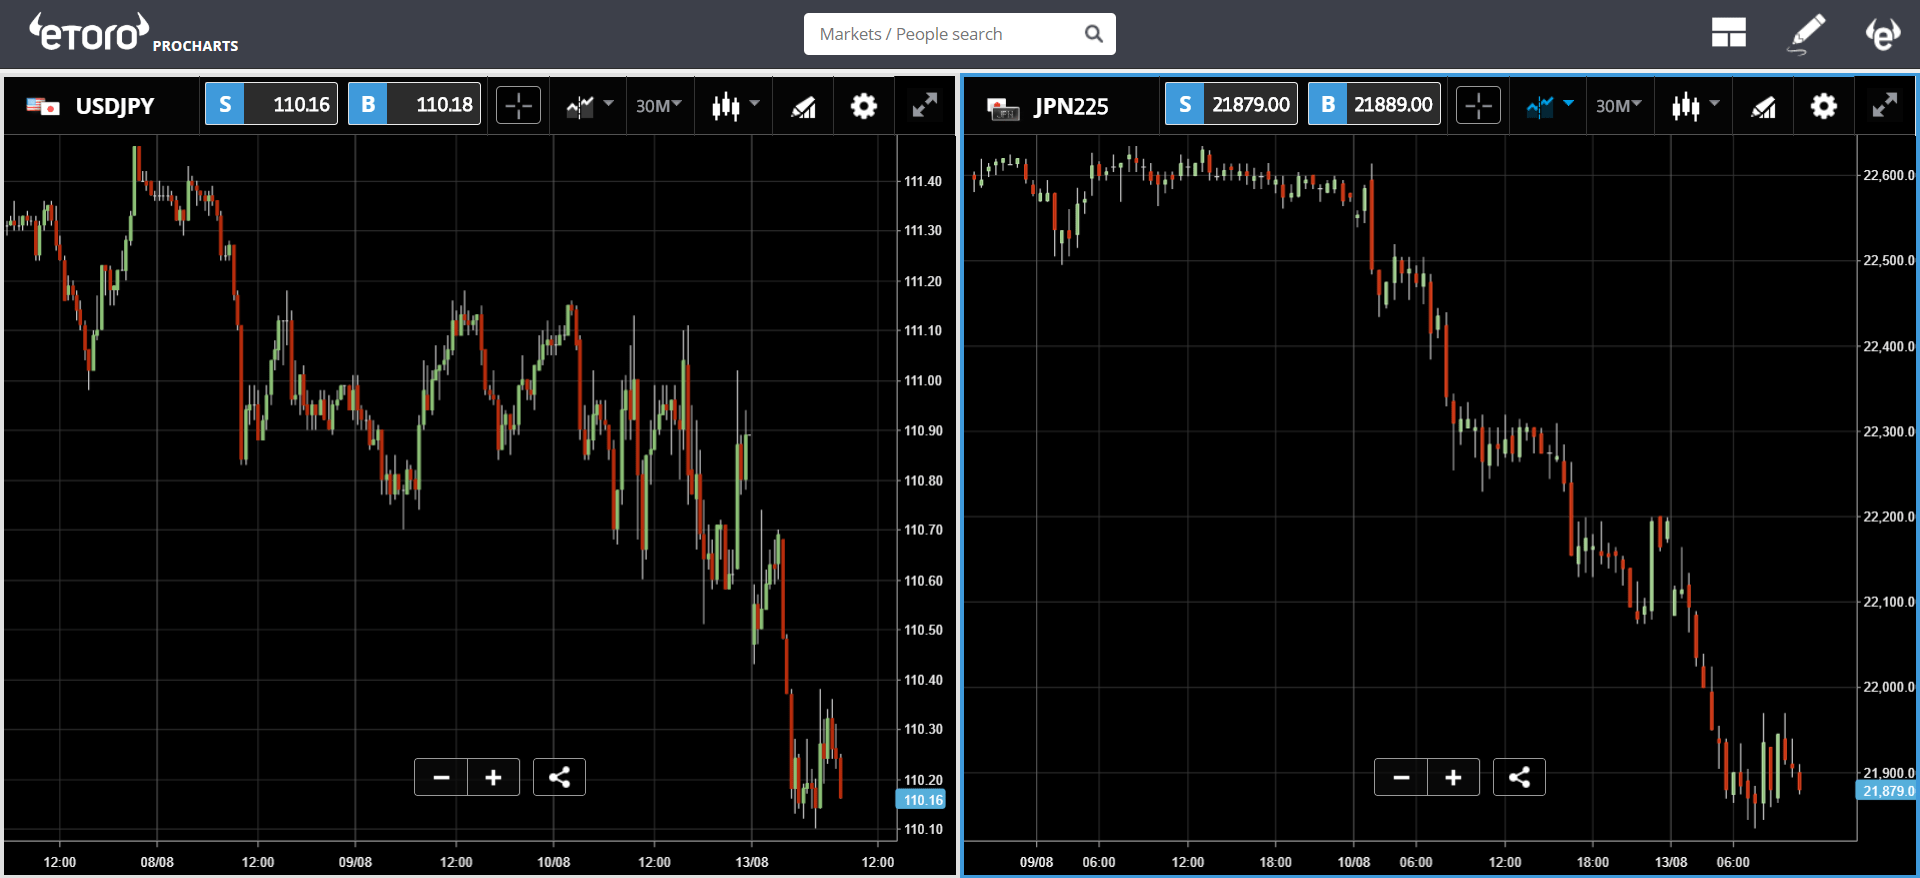 etoro, japan, yen, markets, lira, bitcoin, crypto